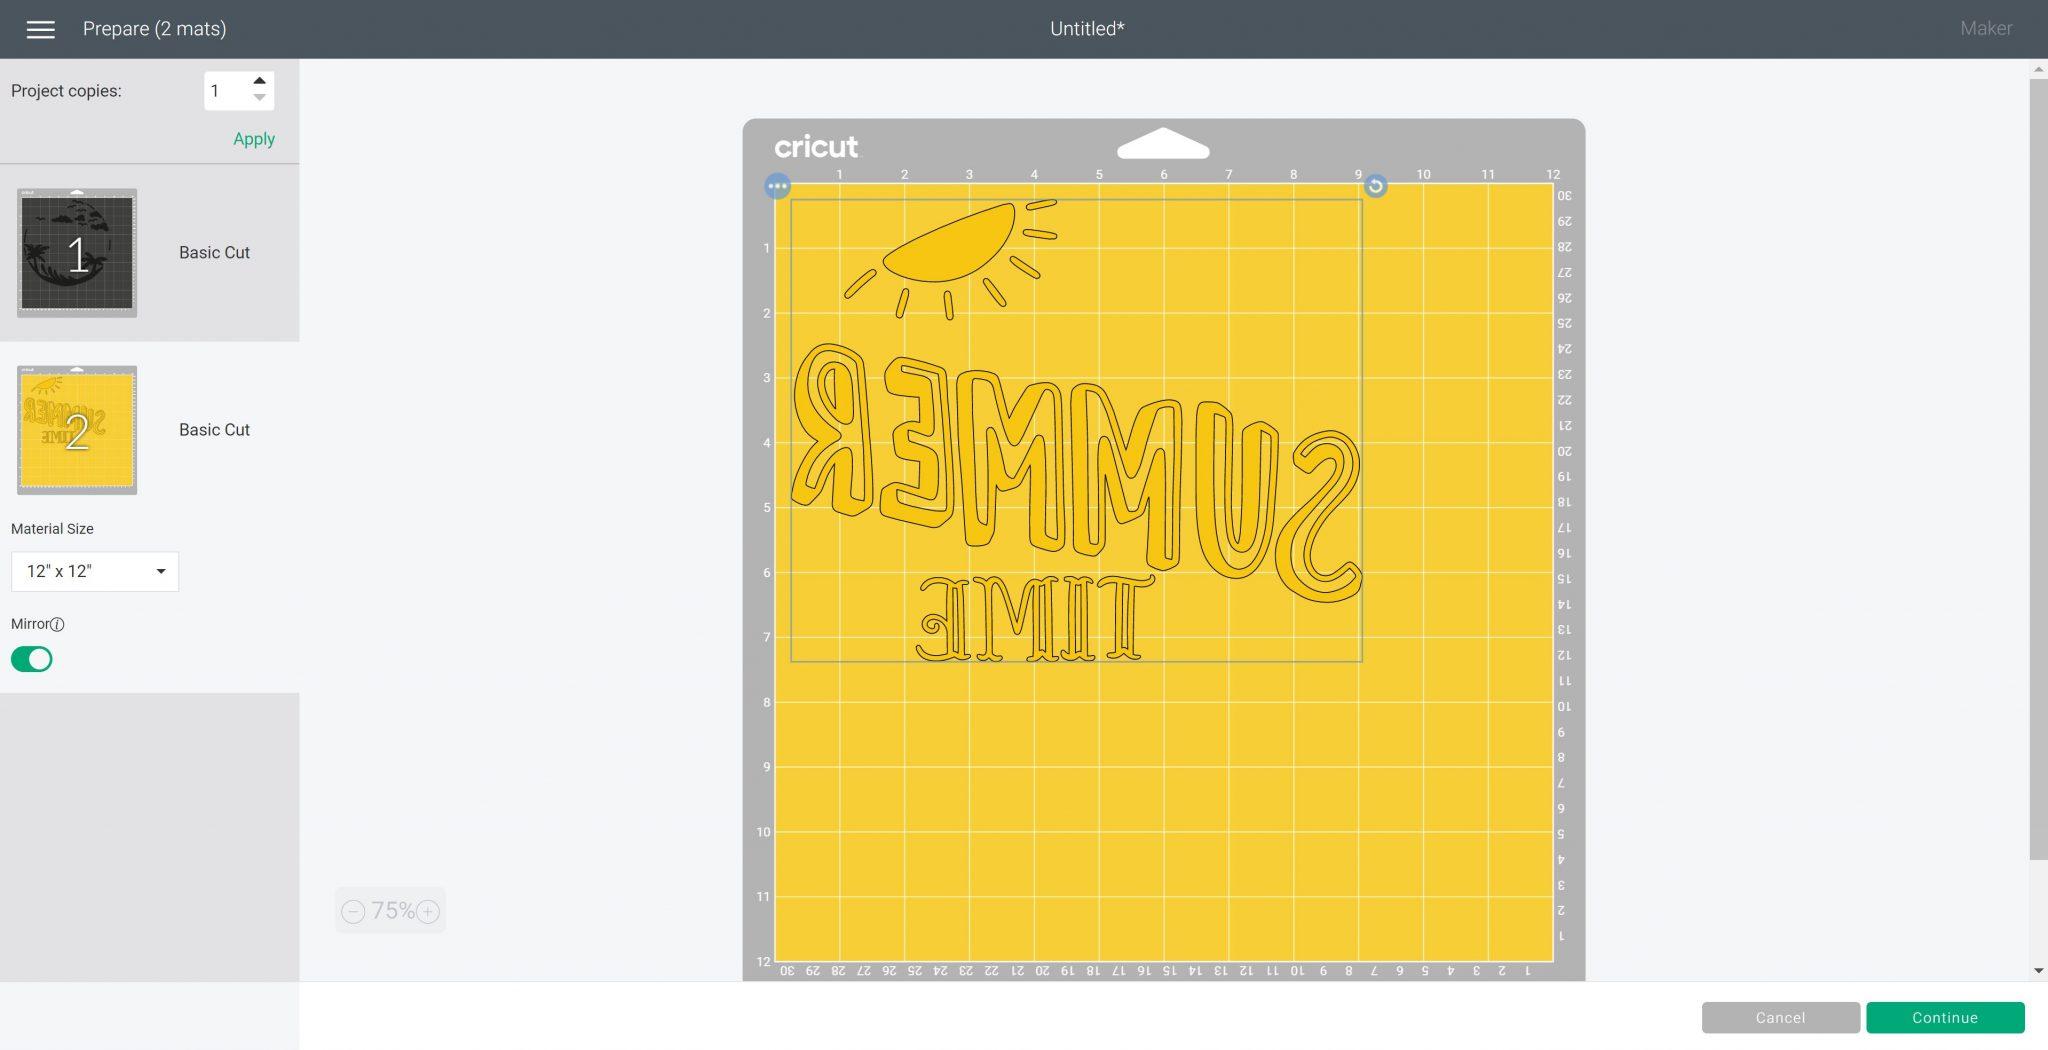 mirroring image in cricut design space